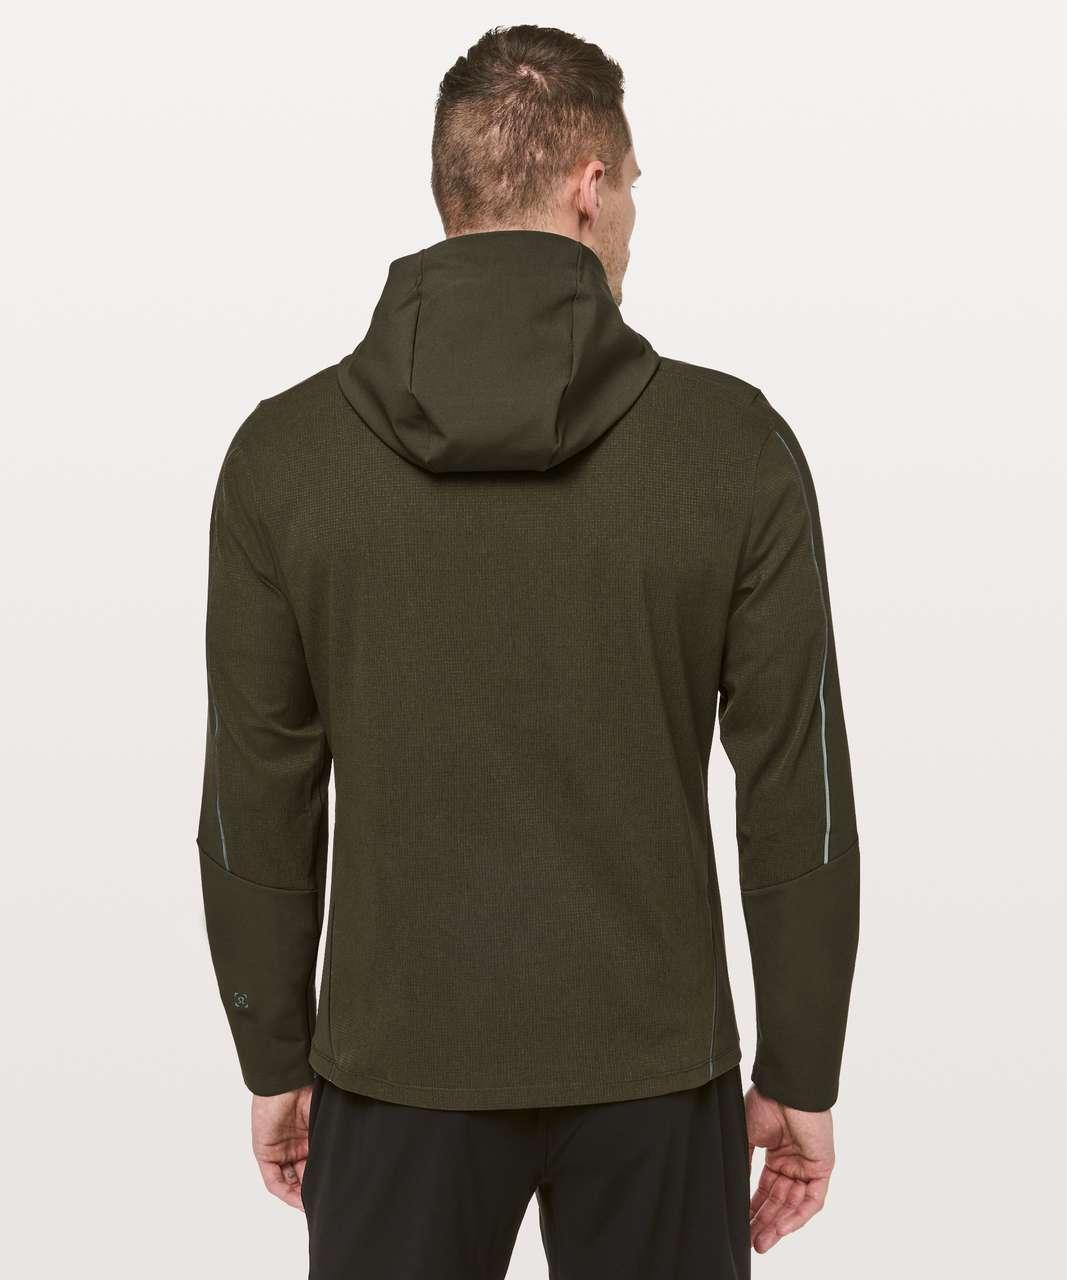 Lululemon Warp Lite Jacket - Dark Olive